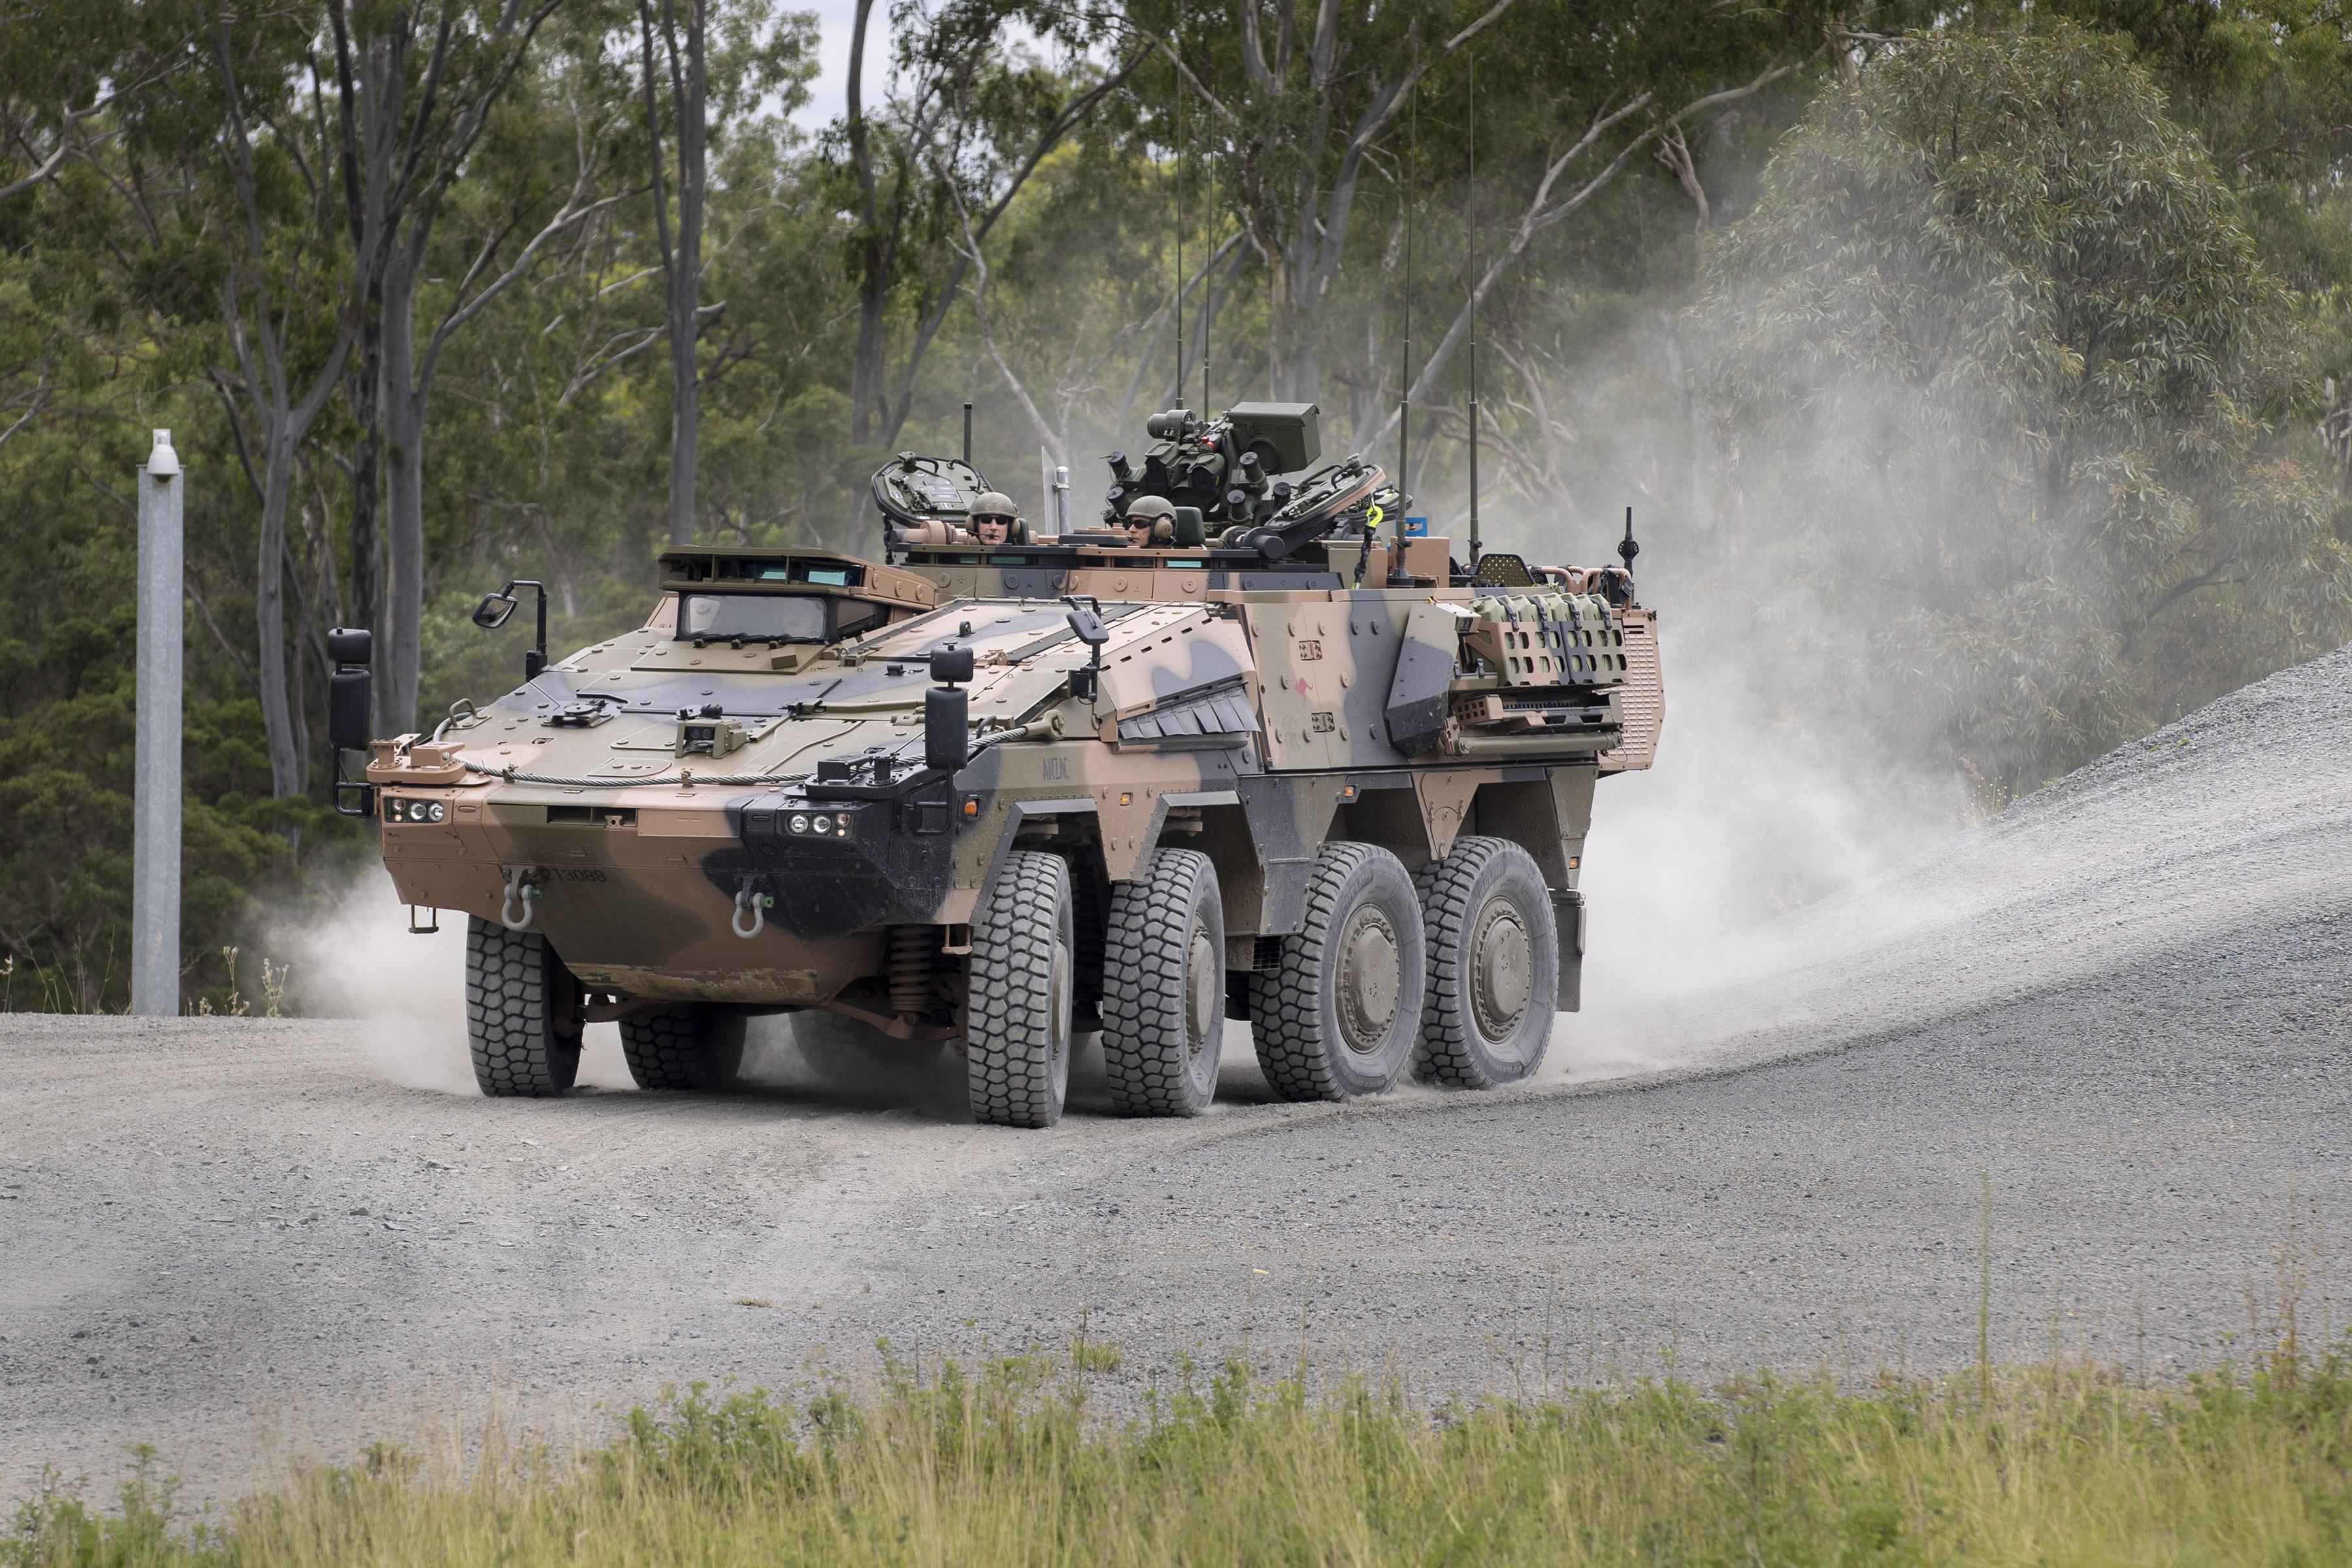 Boxer_CRV_-_Aust_Dep_Defence.jpg